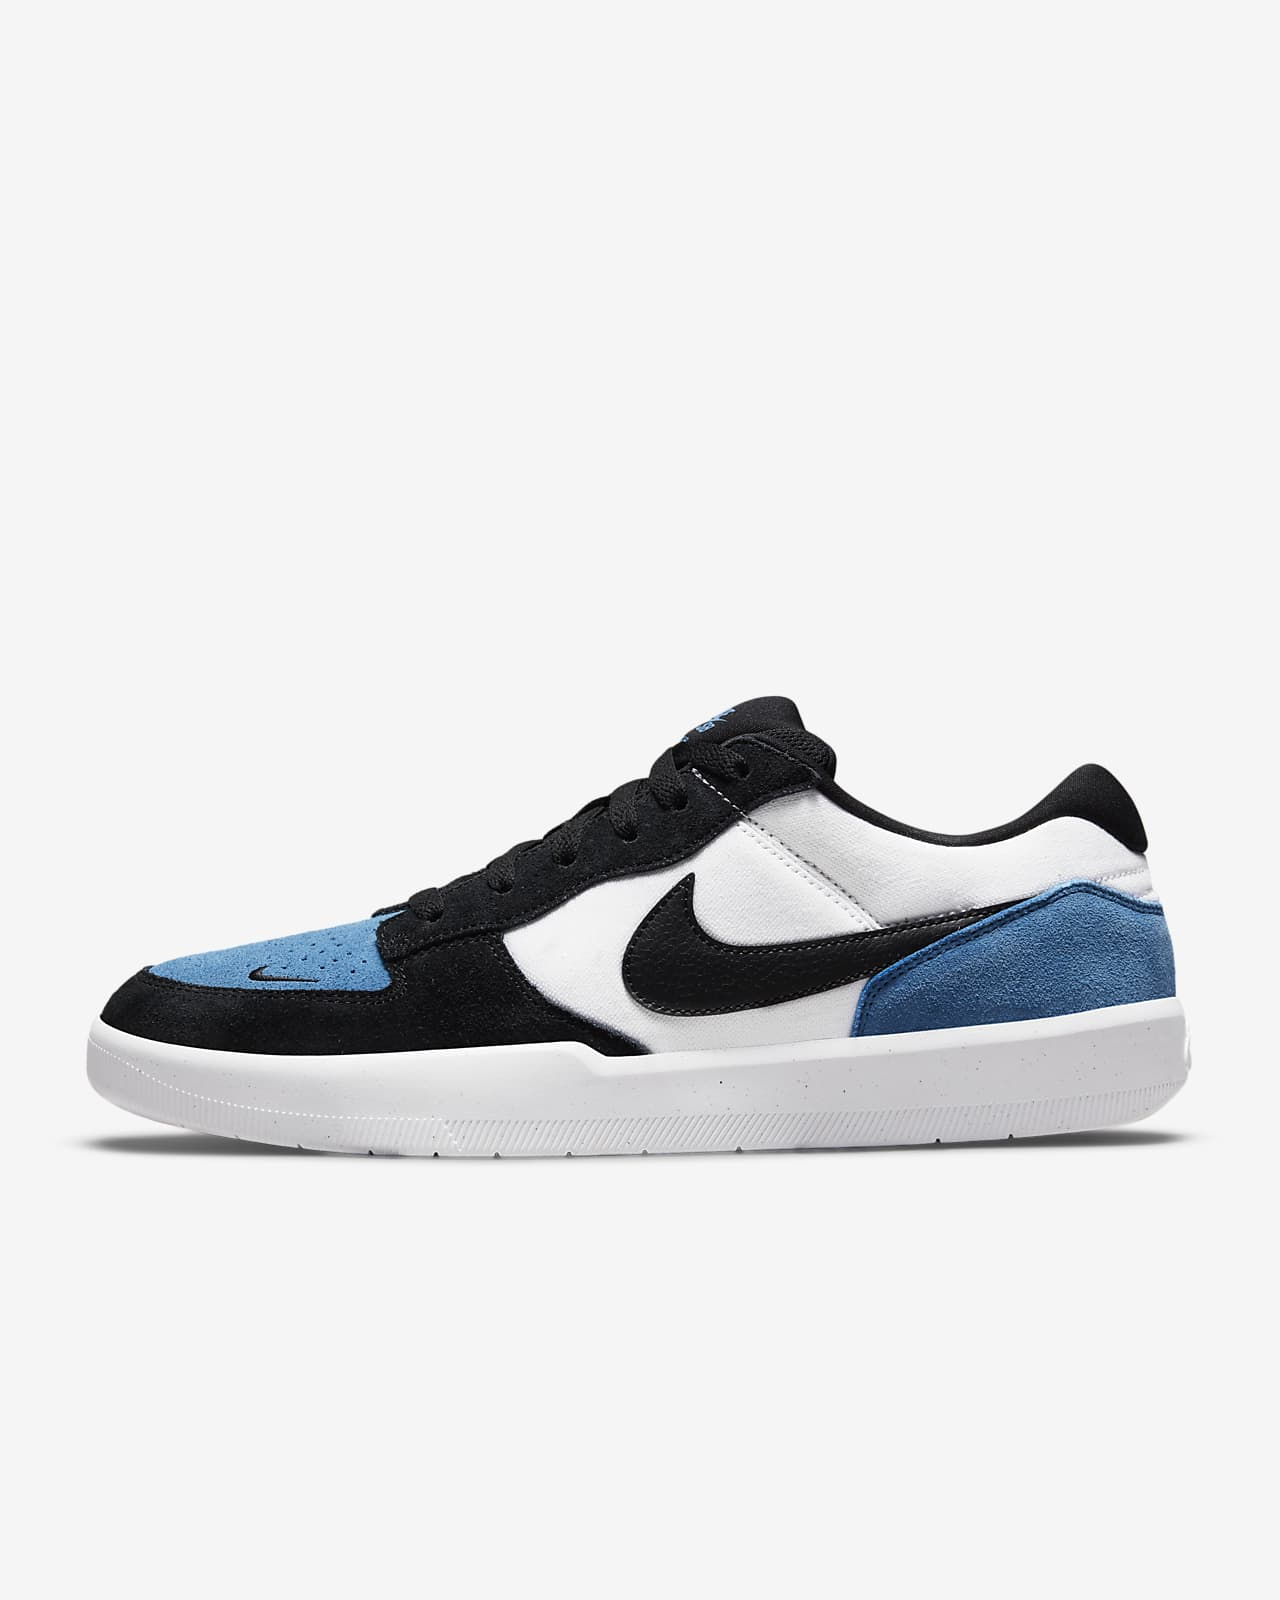 Skateboardsko Nike SB Force 58